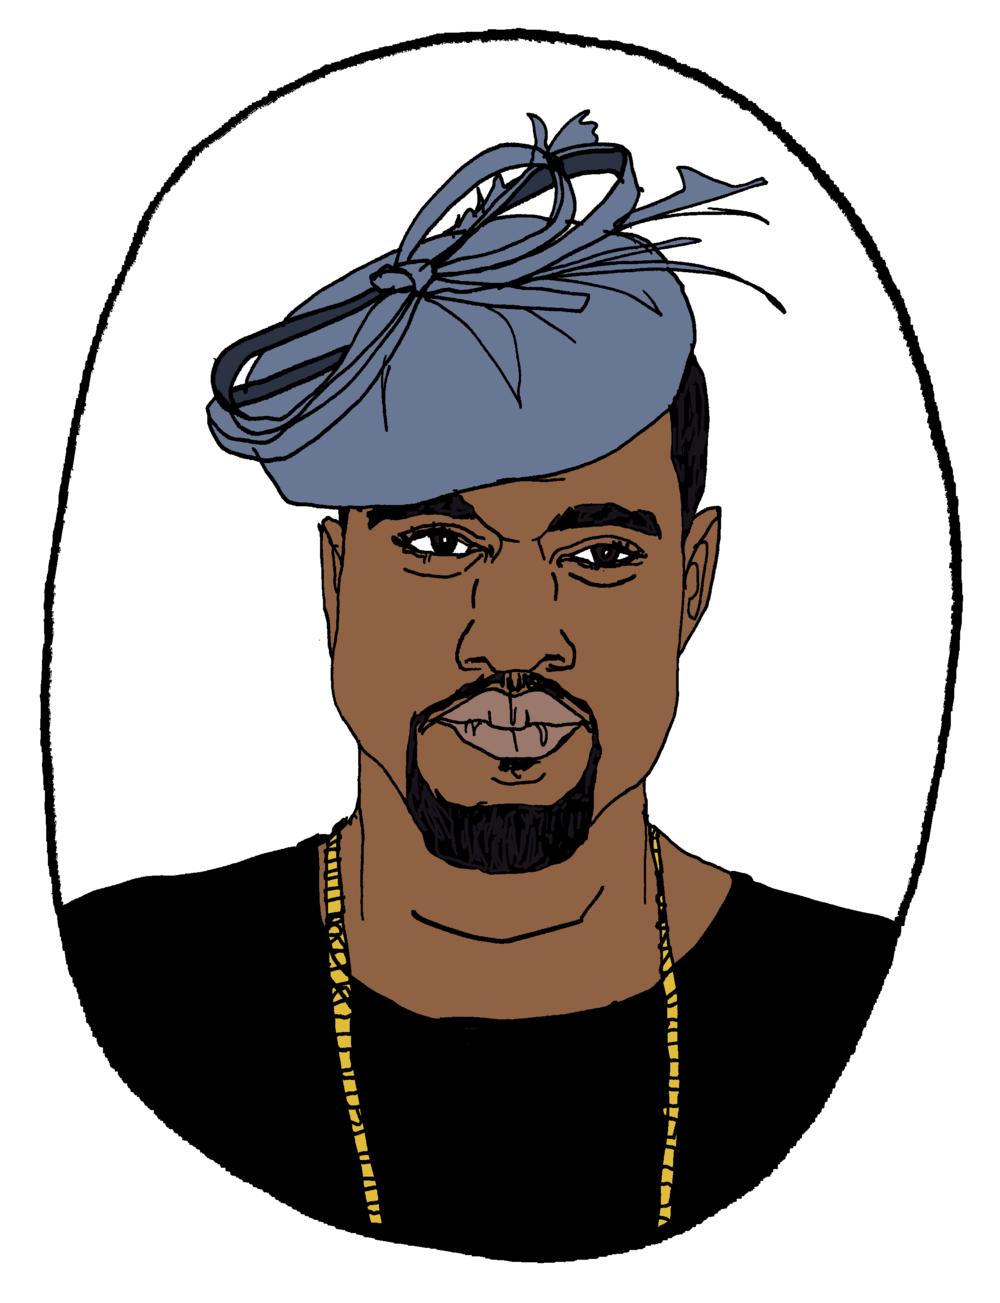 Kanye in Kate Middleton's Hat